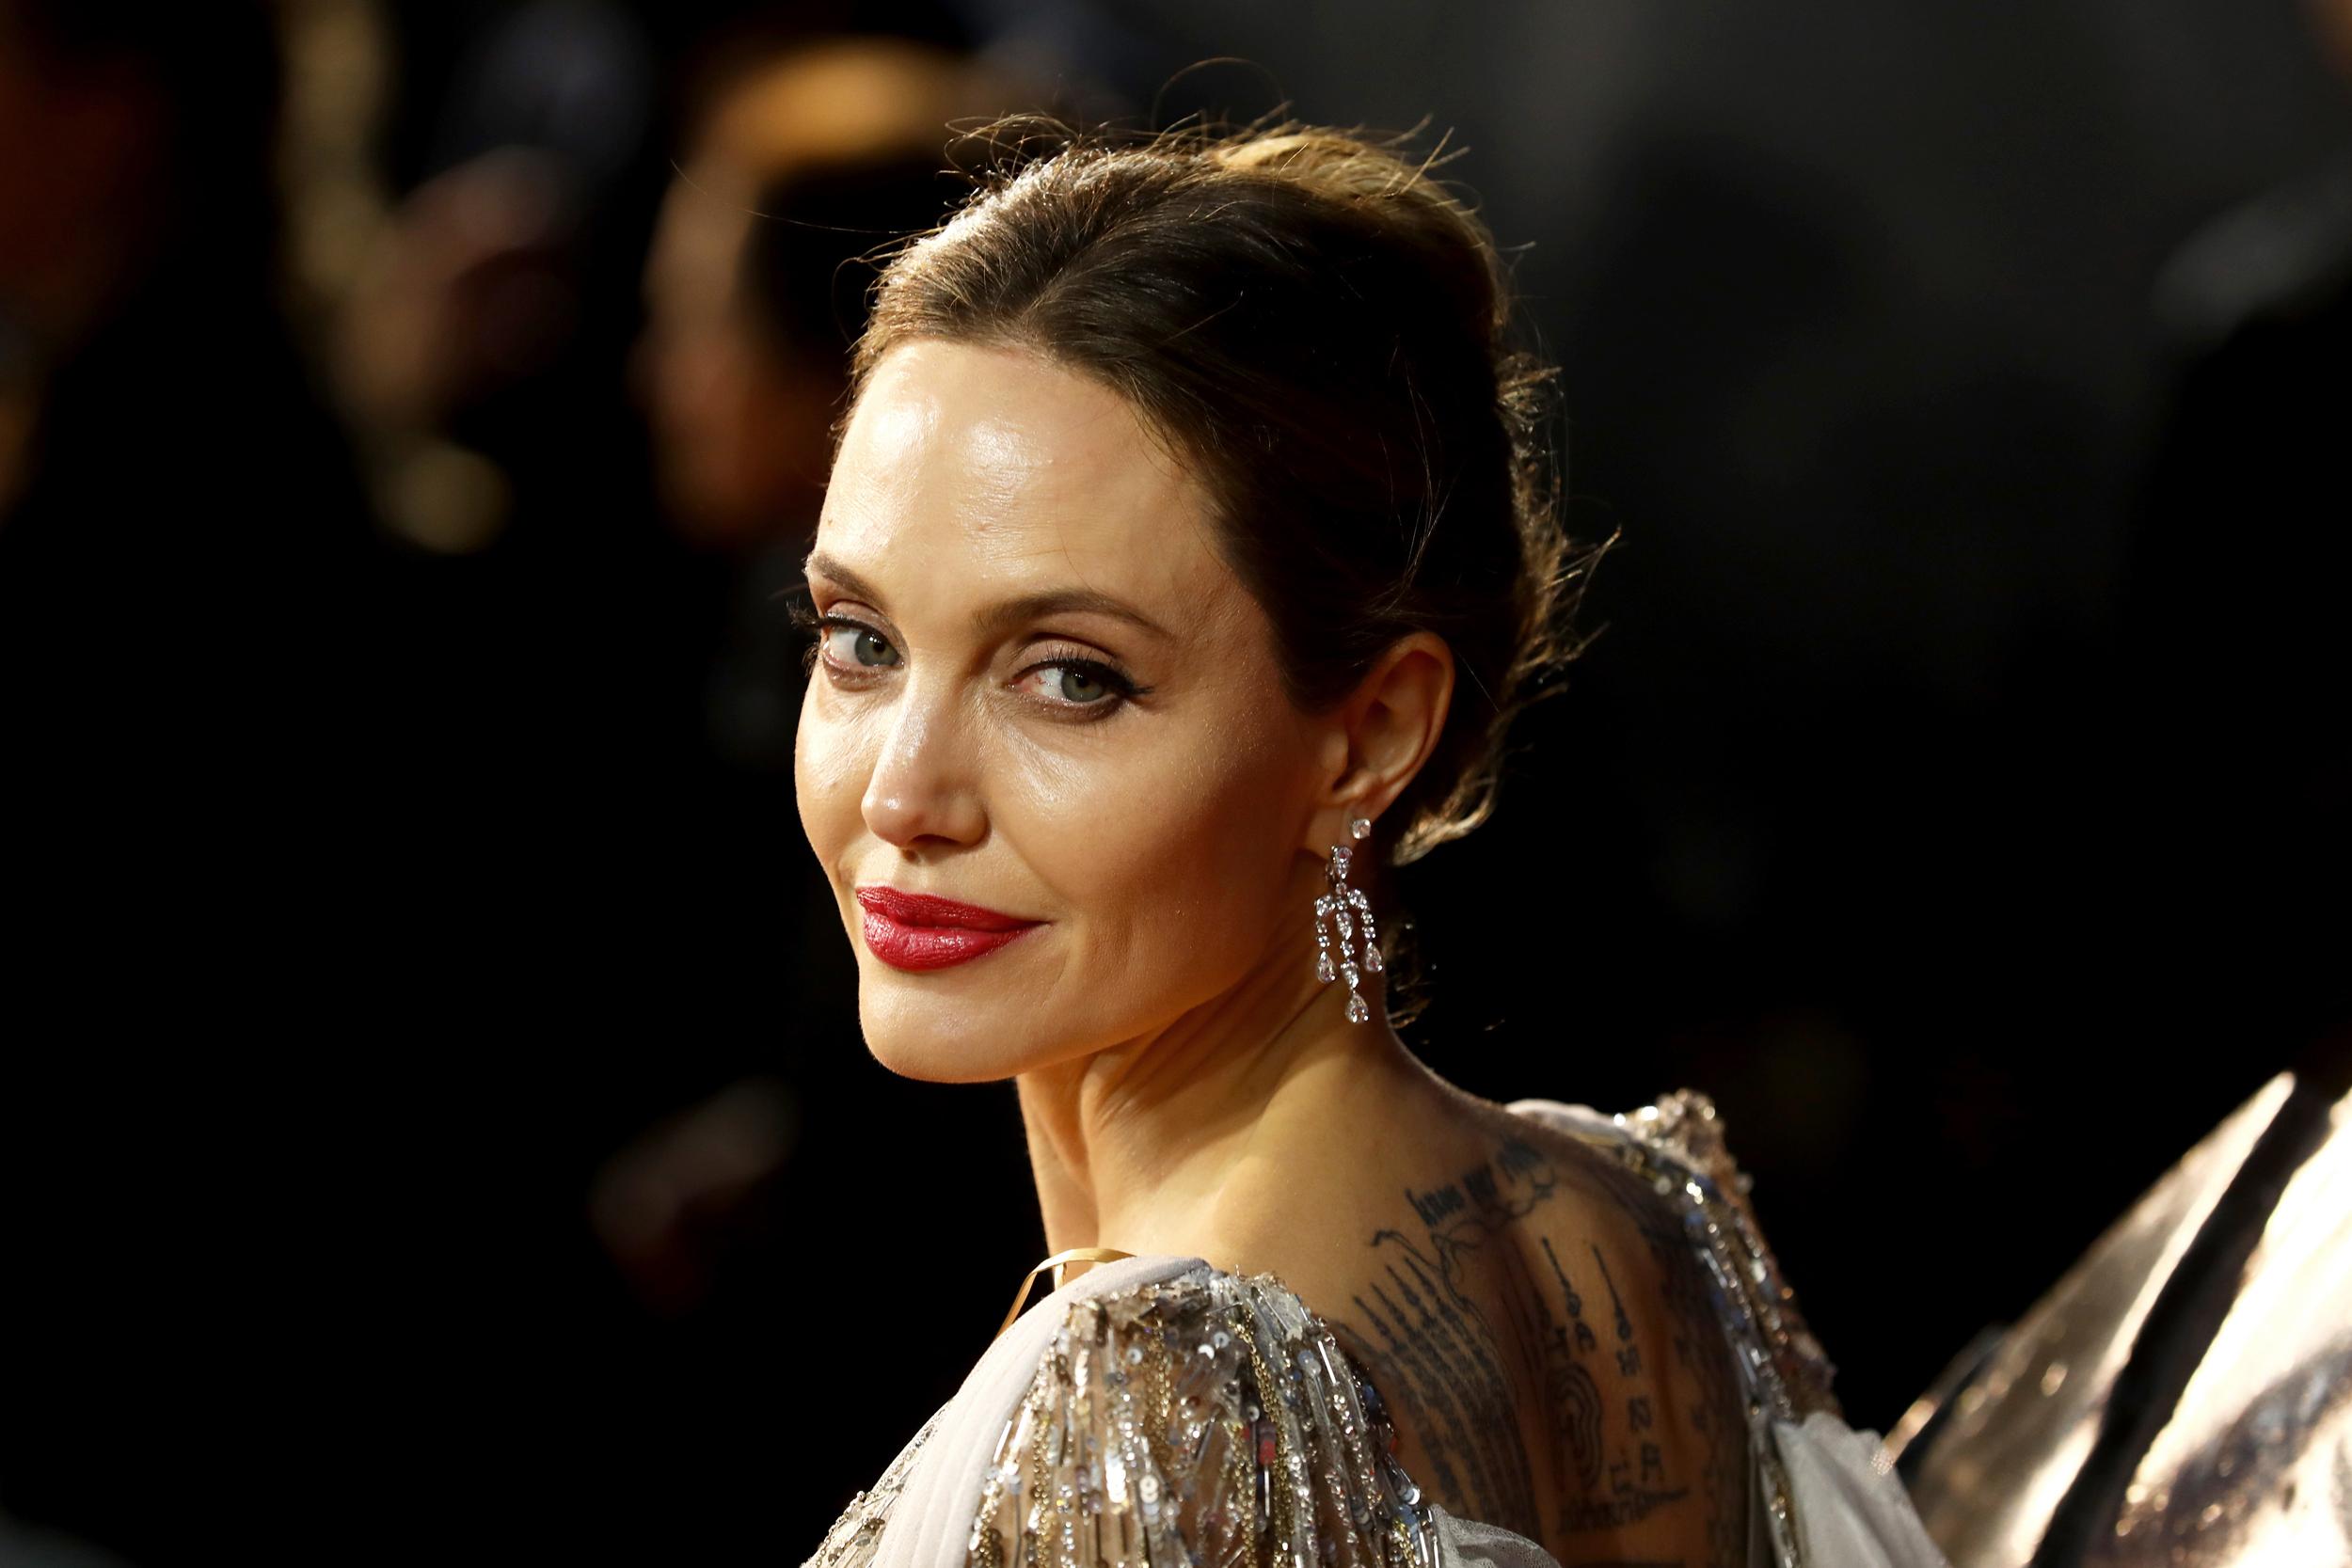 Angelina Jolie opens up about Harvey Weinstein and Brad Pitt custody battle in new interview